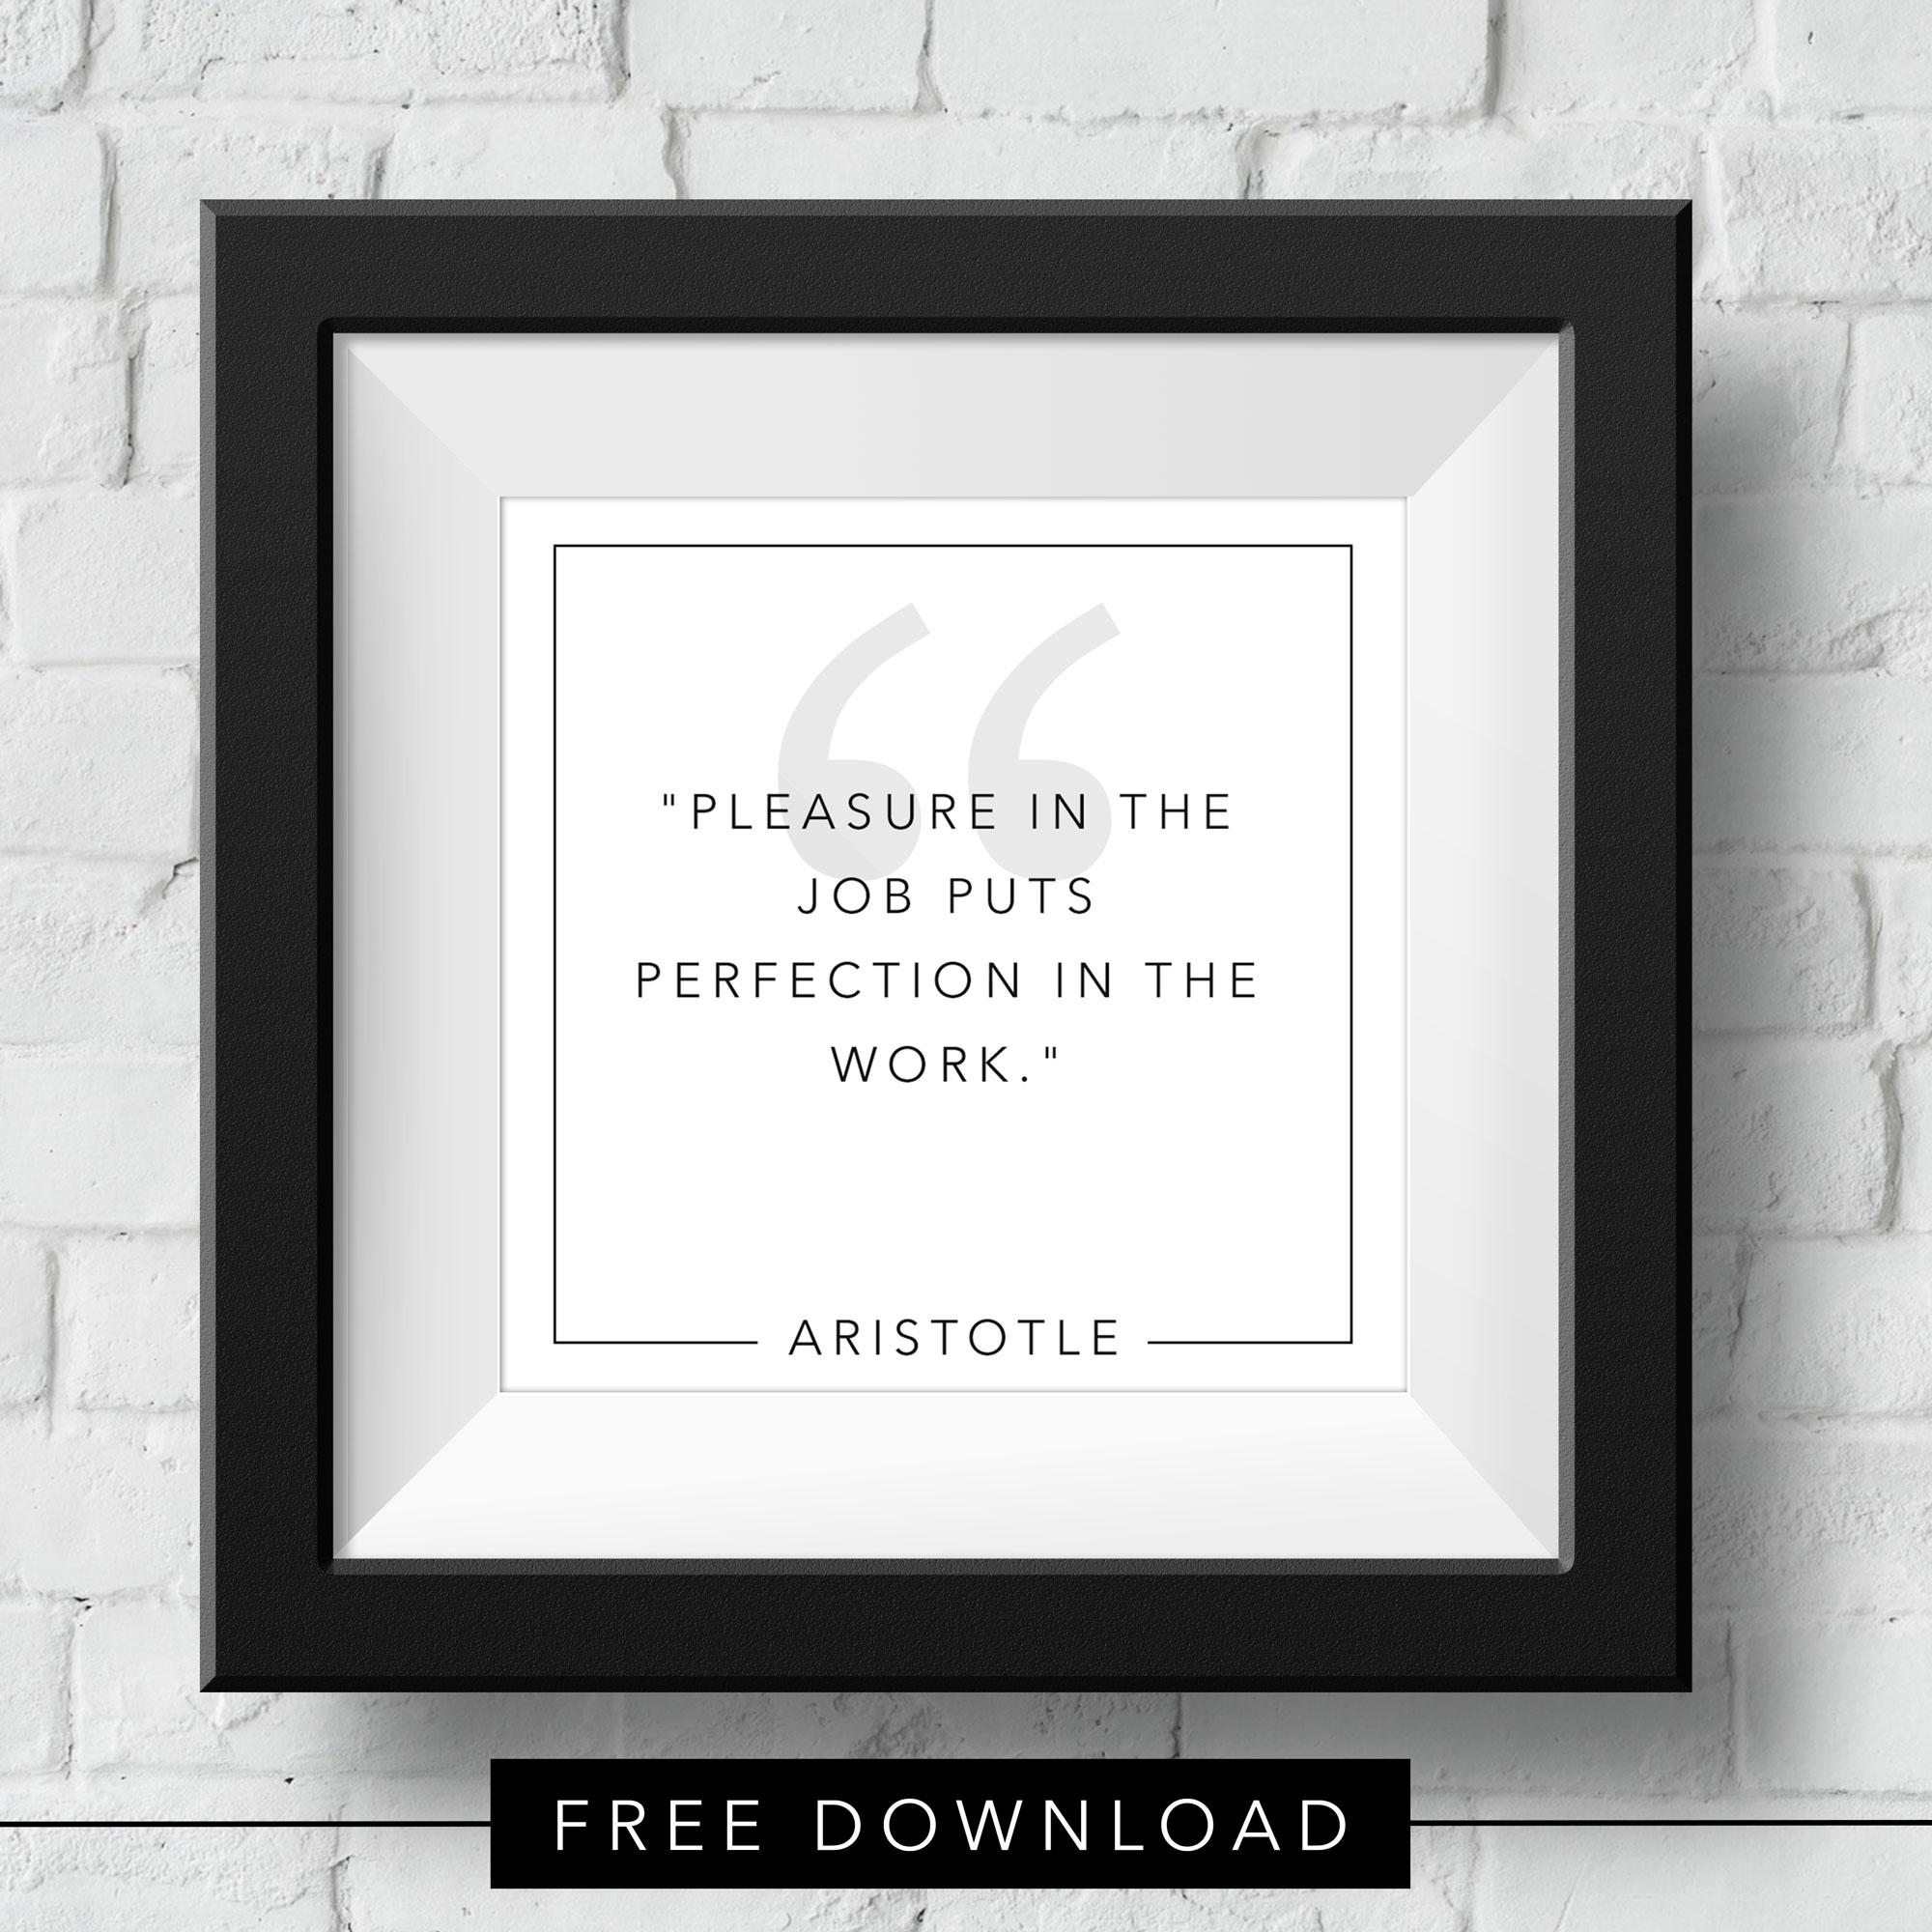 pleasure-aristotle-free-download